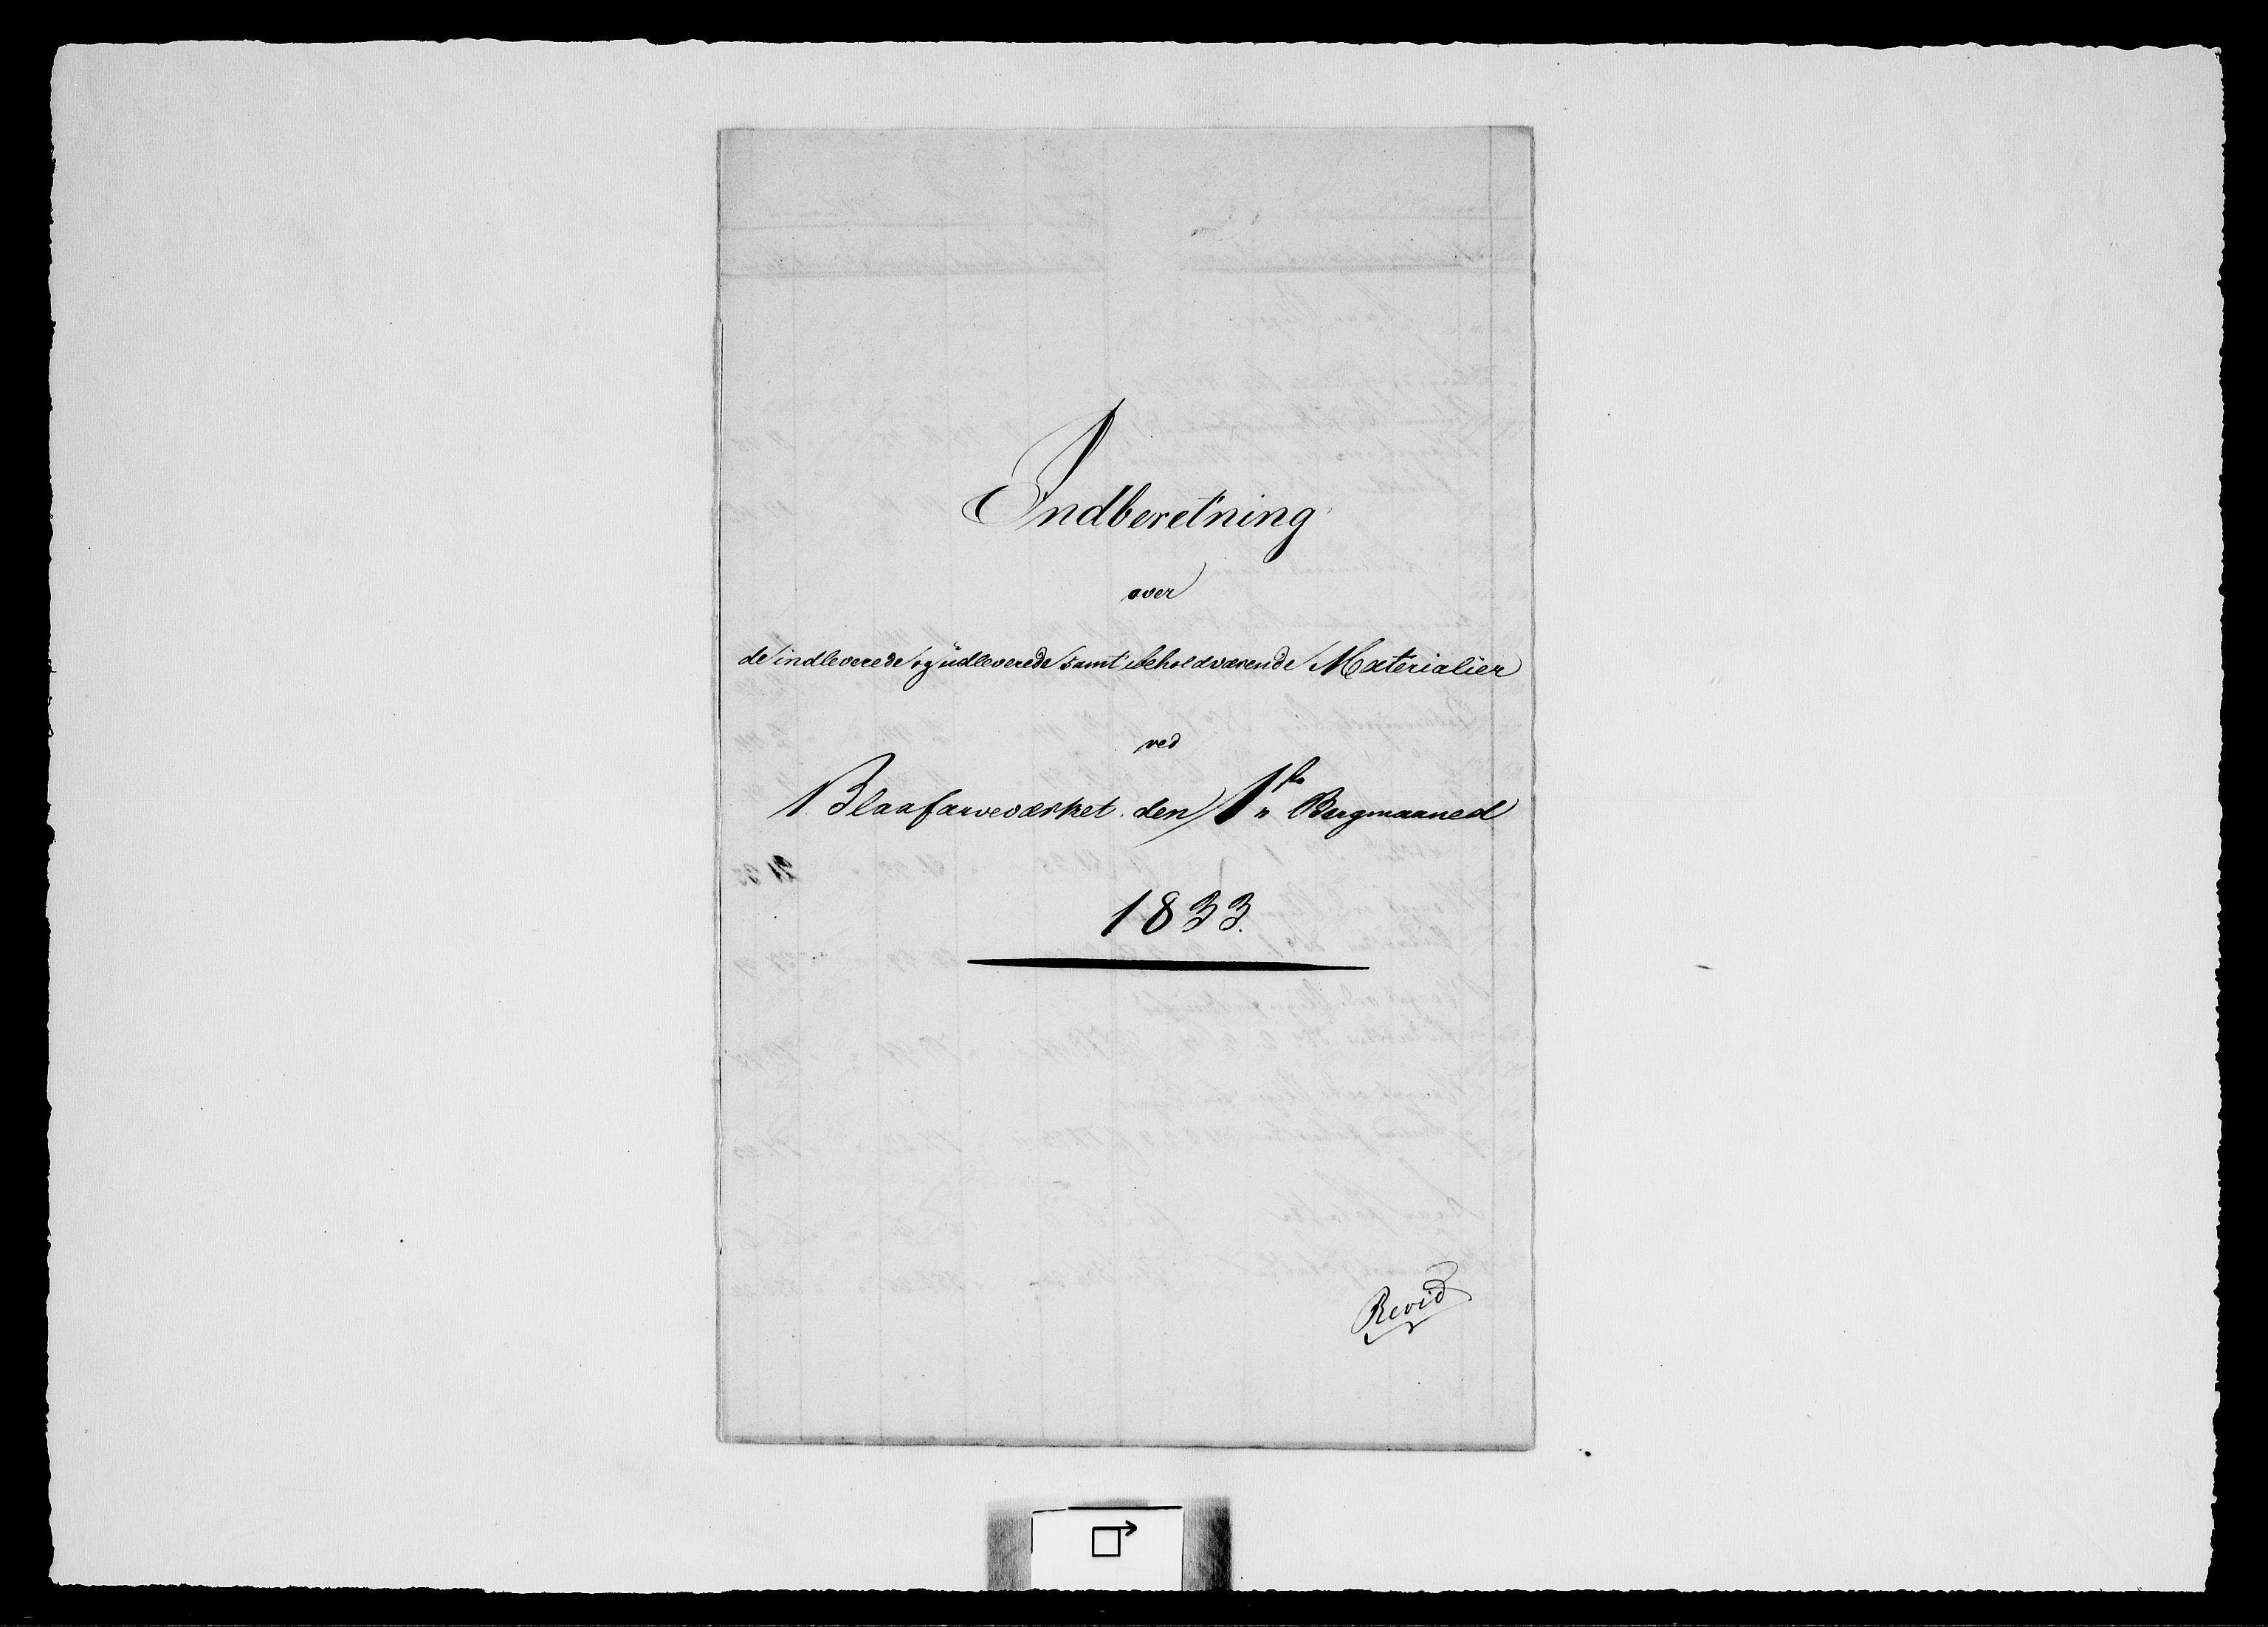 RA, Modums Blaafarveværk, G/Gd/Gdd/L0247, 1833-1835, s. 2